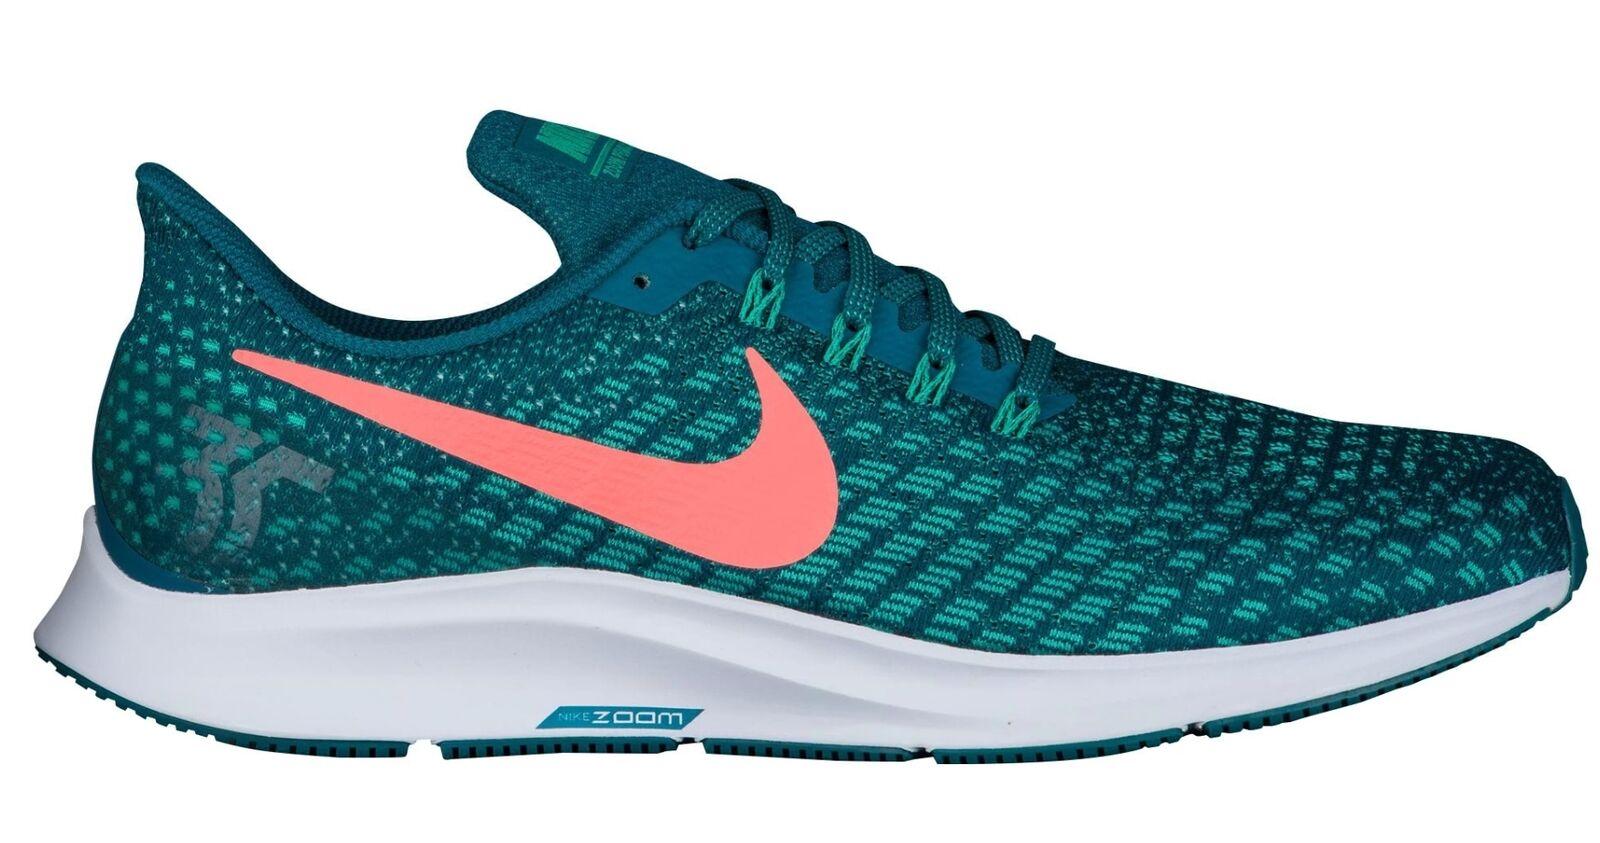 Nike air maglie zoom pegasus 35 uomini 942851-300 geode till maglie air scarpe taglia 10 d10010